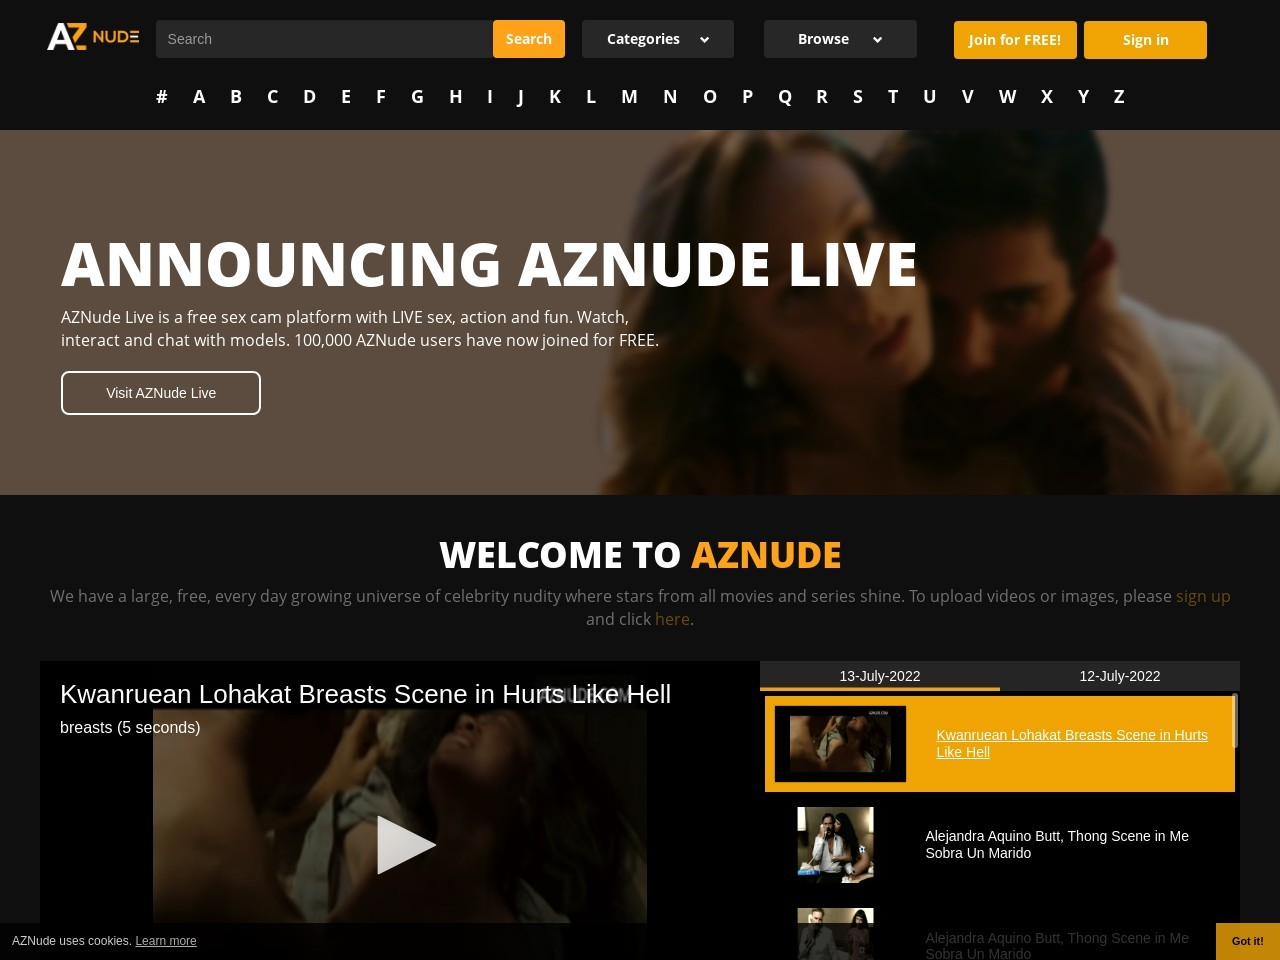 AZNude - Nude Celebrities from A to Z